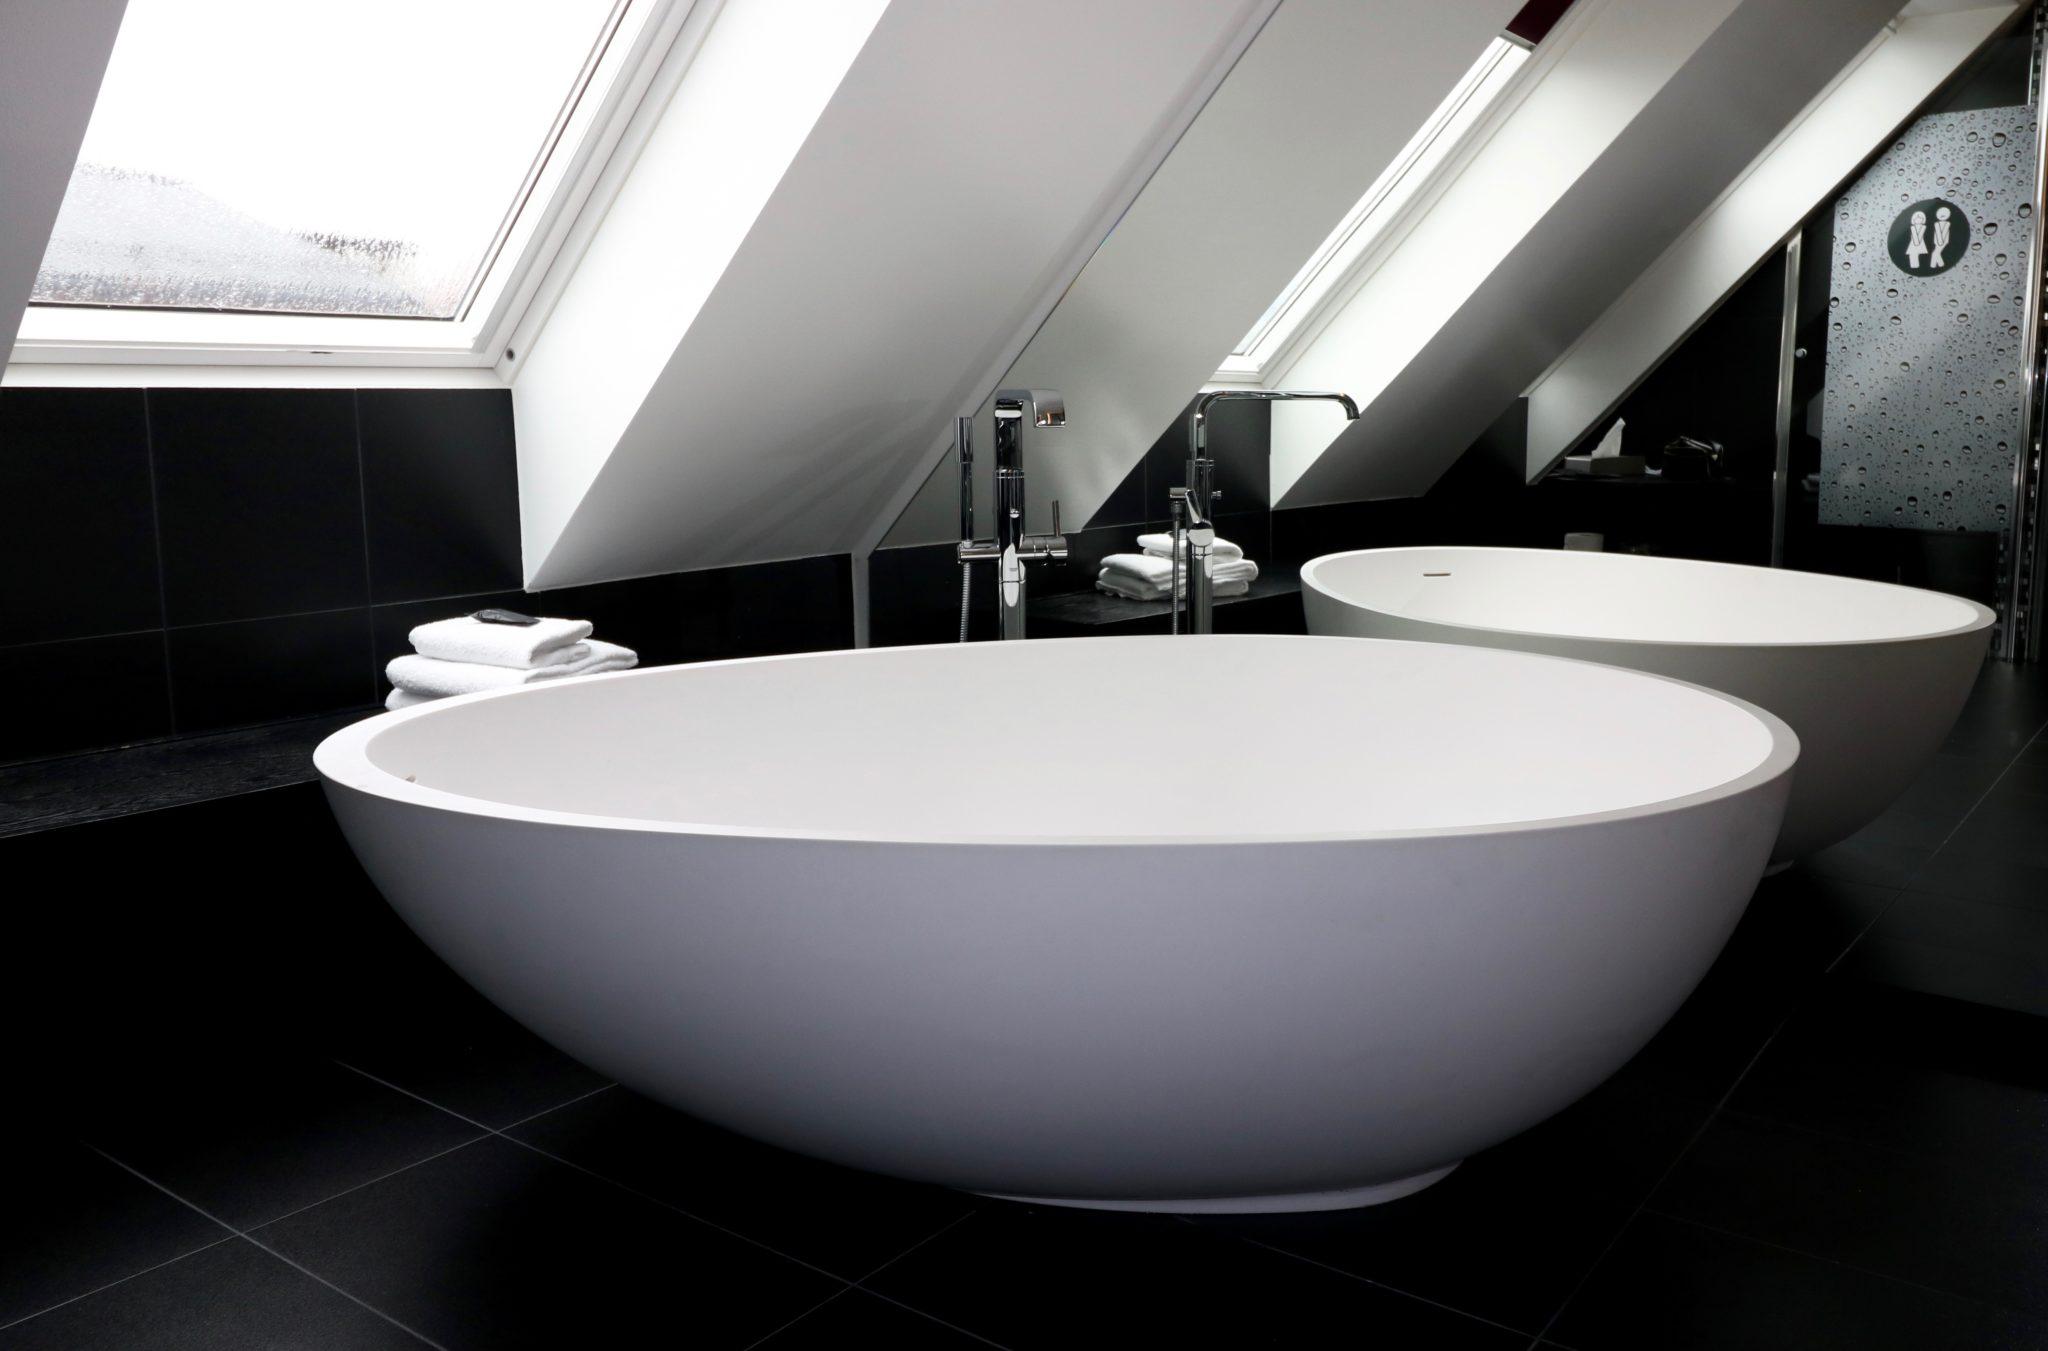 Arredo bagno,mobili bagno,mobili bagno sospesi e a terra - IMG 0023 1